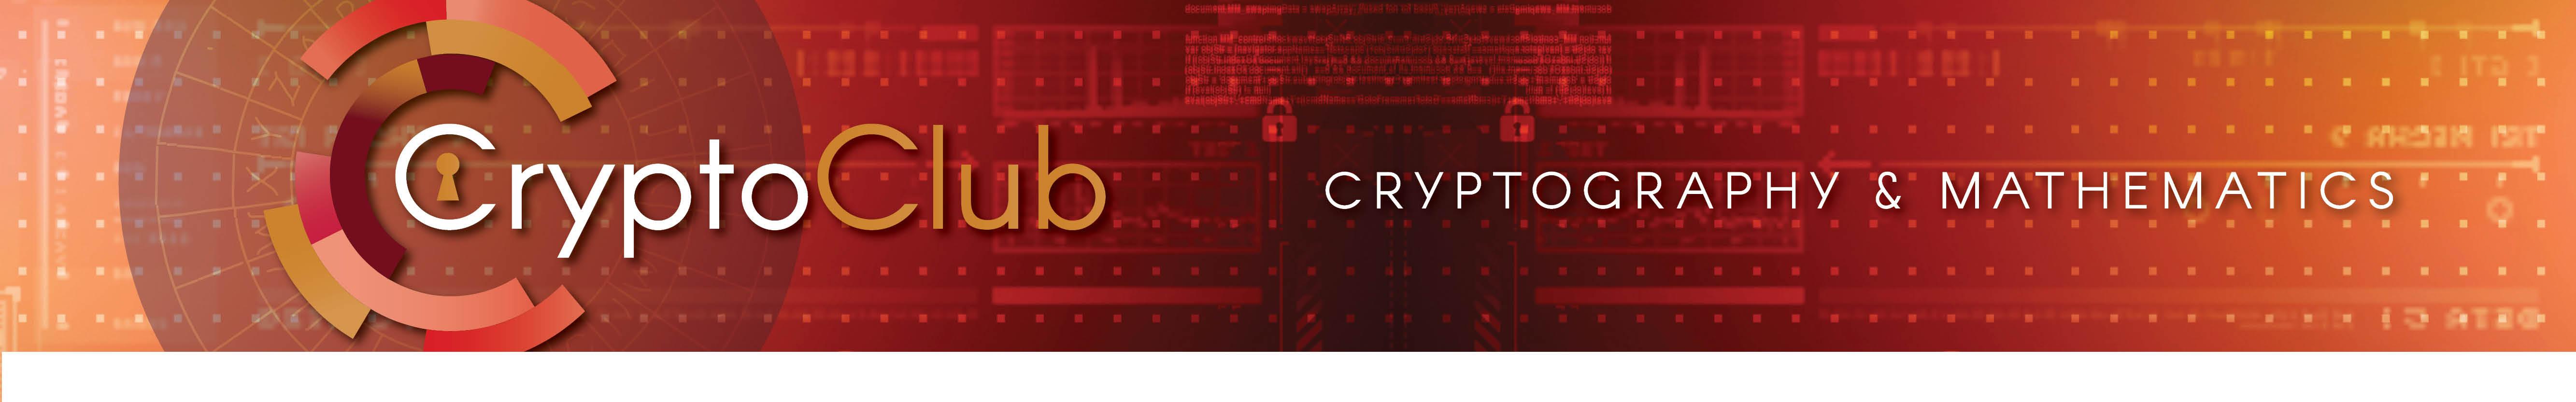 CryptoClub: Cryptography and Mathematics Curriculum